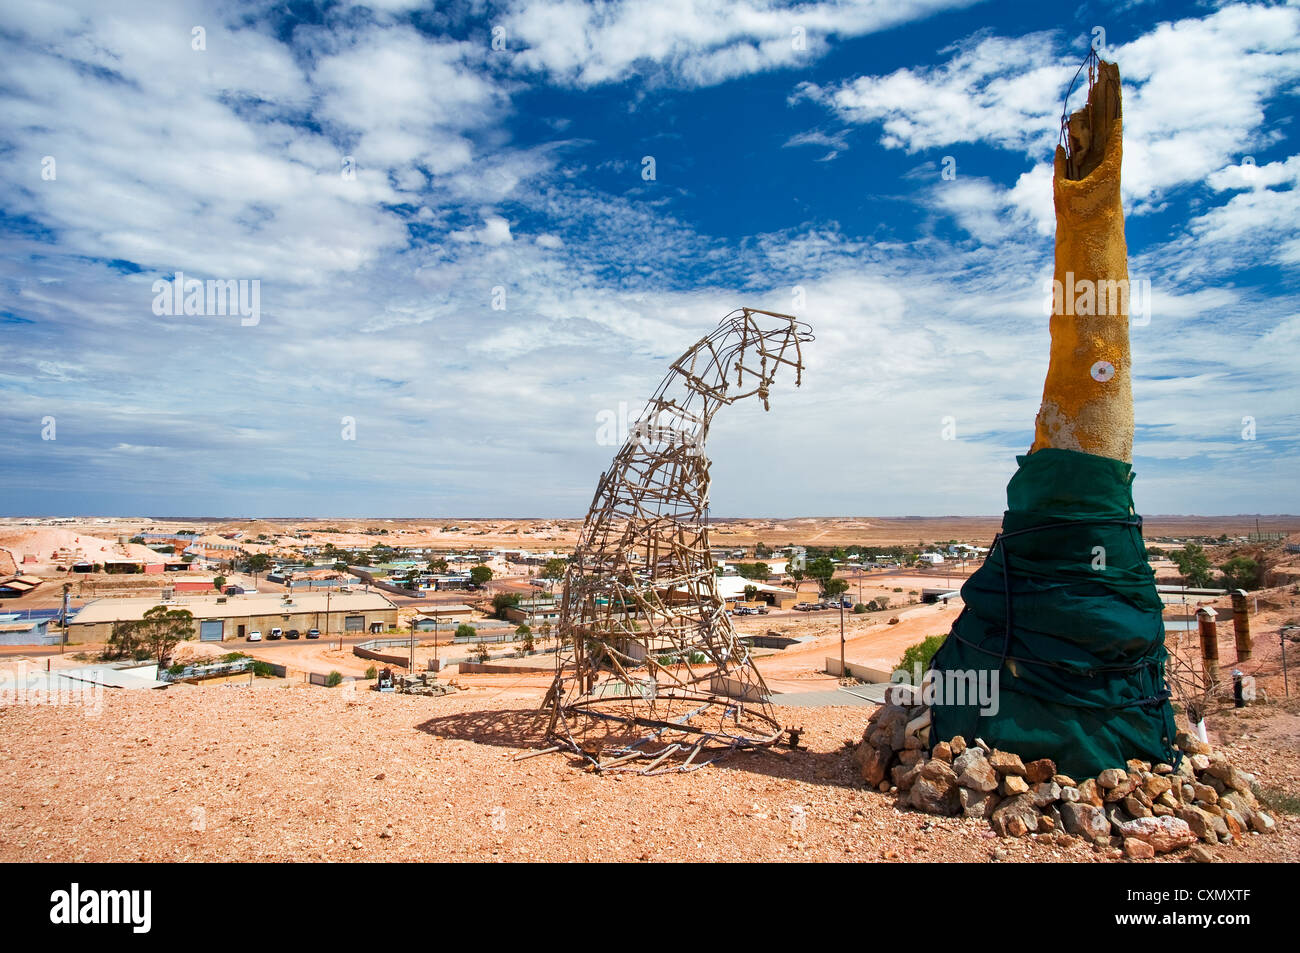 Opal City Coober Pedy in the South Australian desert. - Stock Image